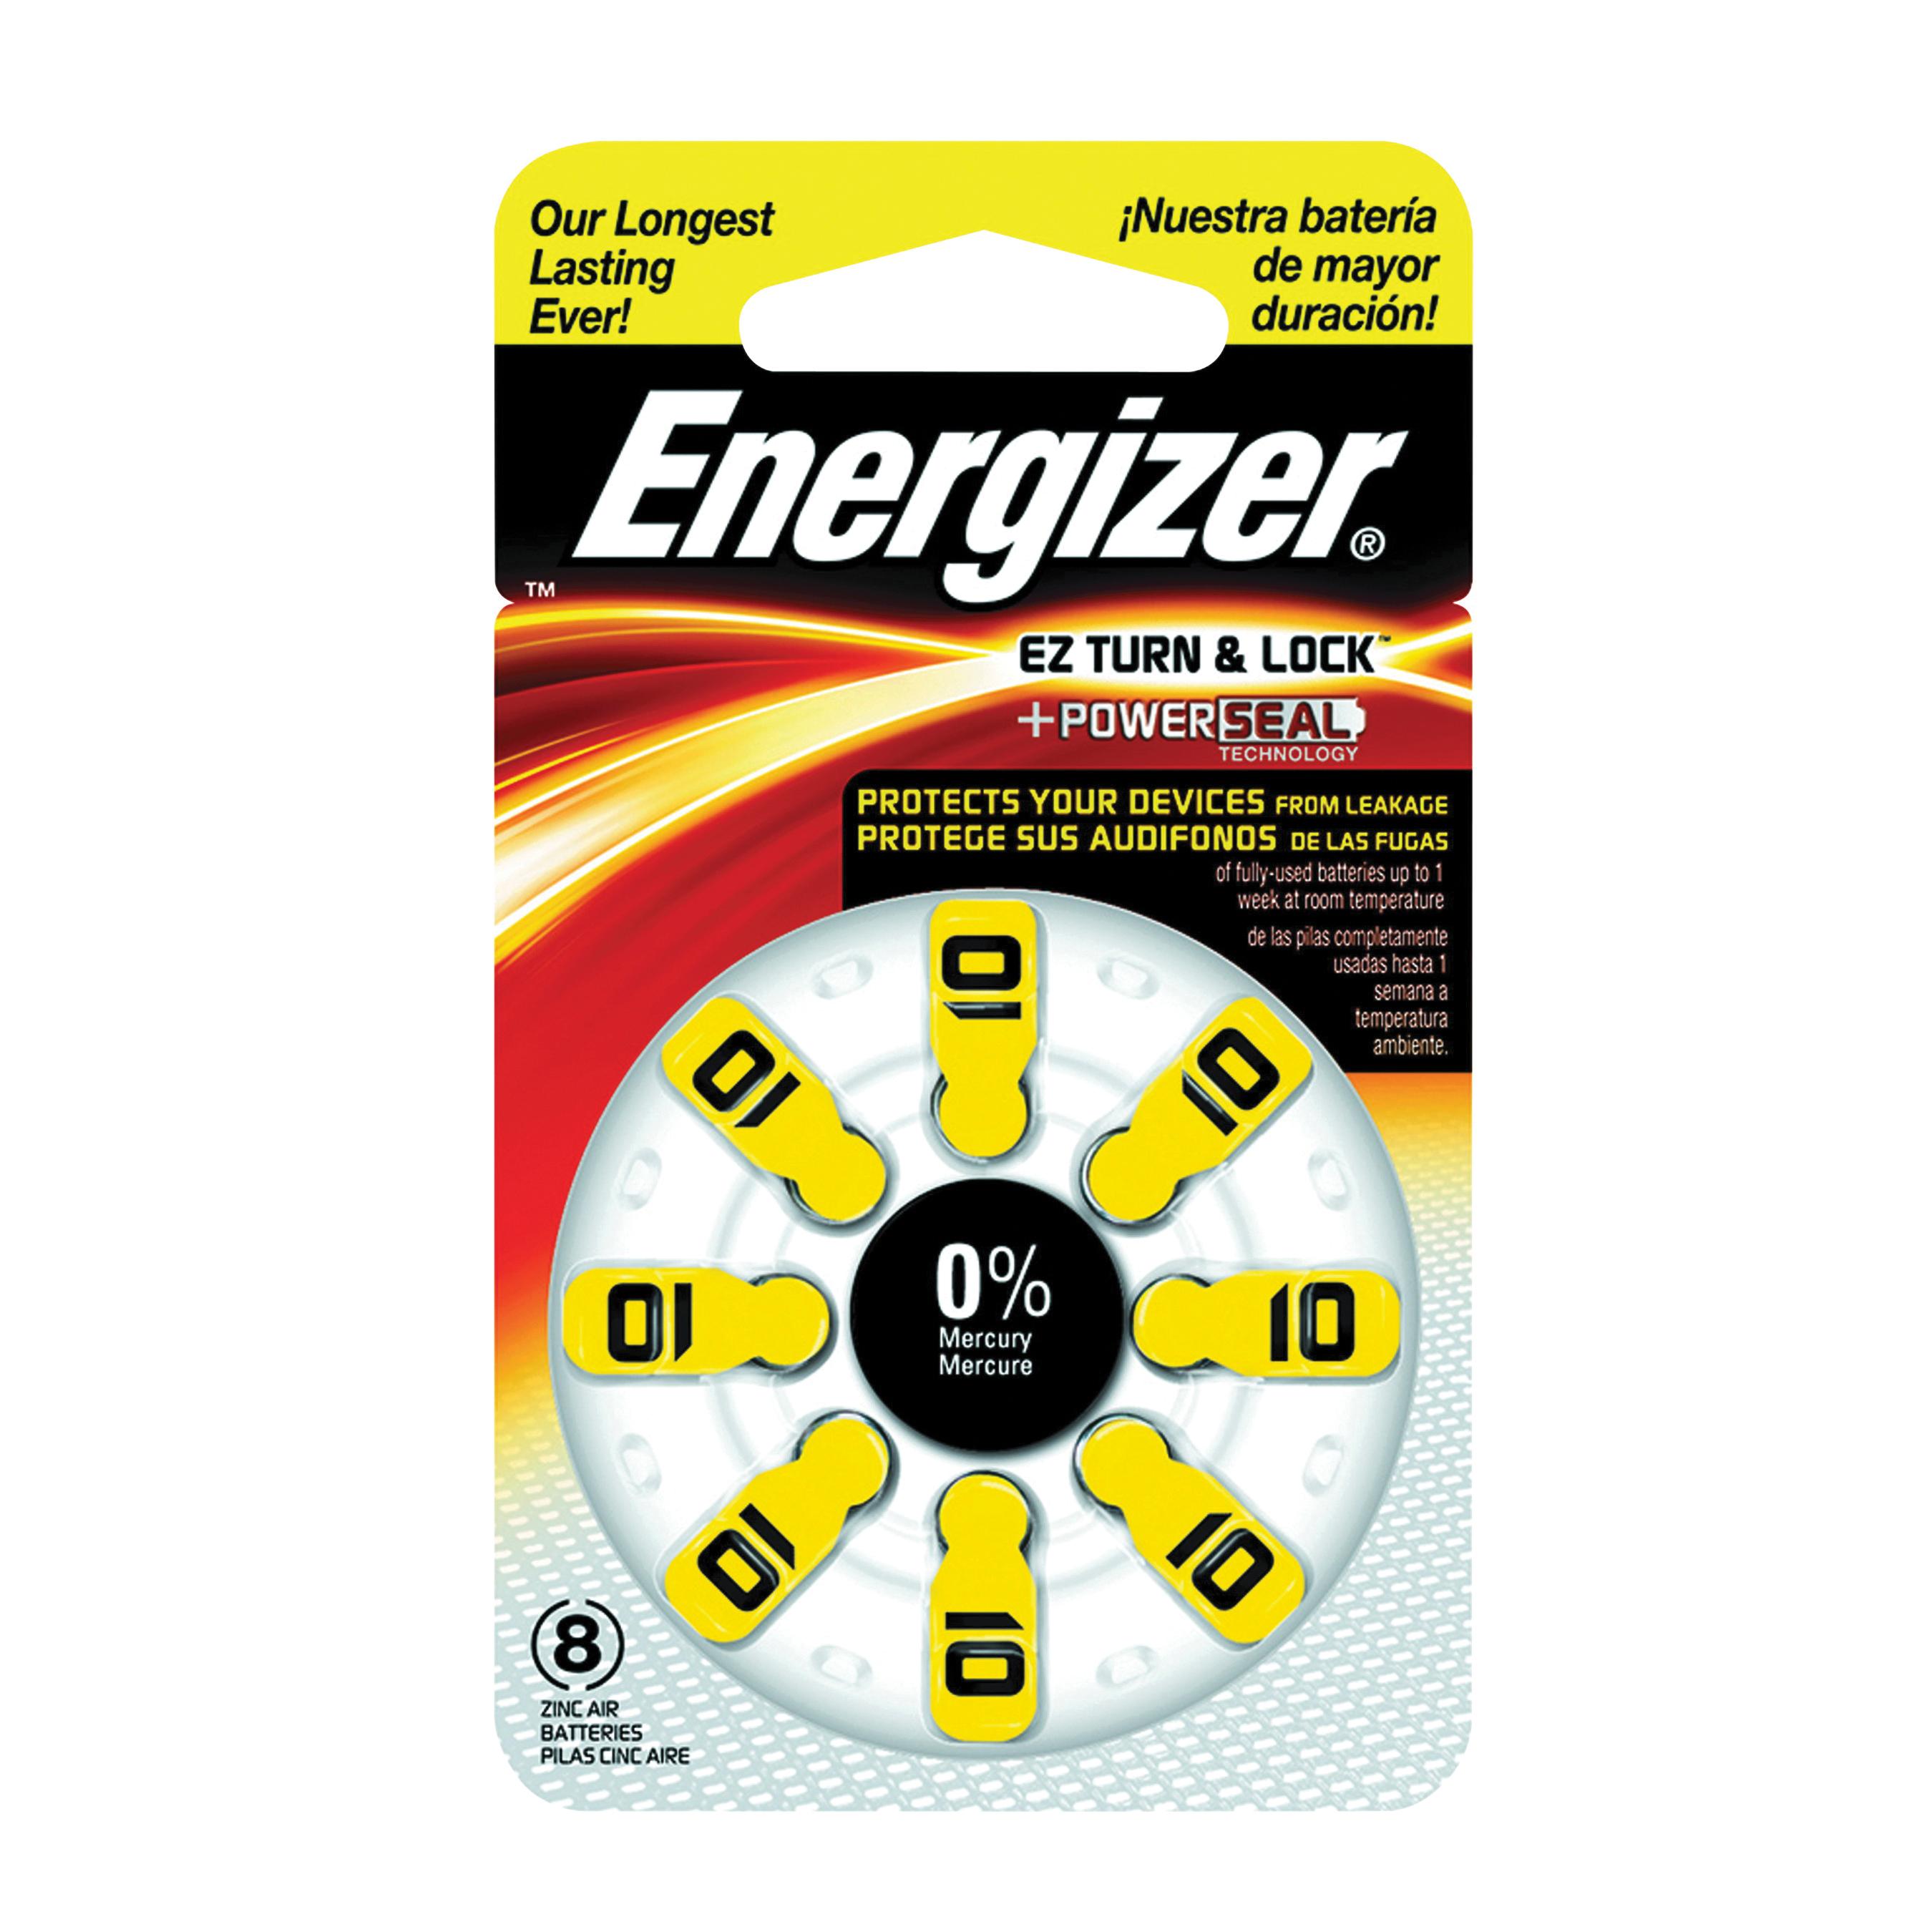 Picture of Energizer 10 Series AZ10DP-8 Hearing Aid Battery, 1.4 V Battery, 89 mAh, Zinc-Air